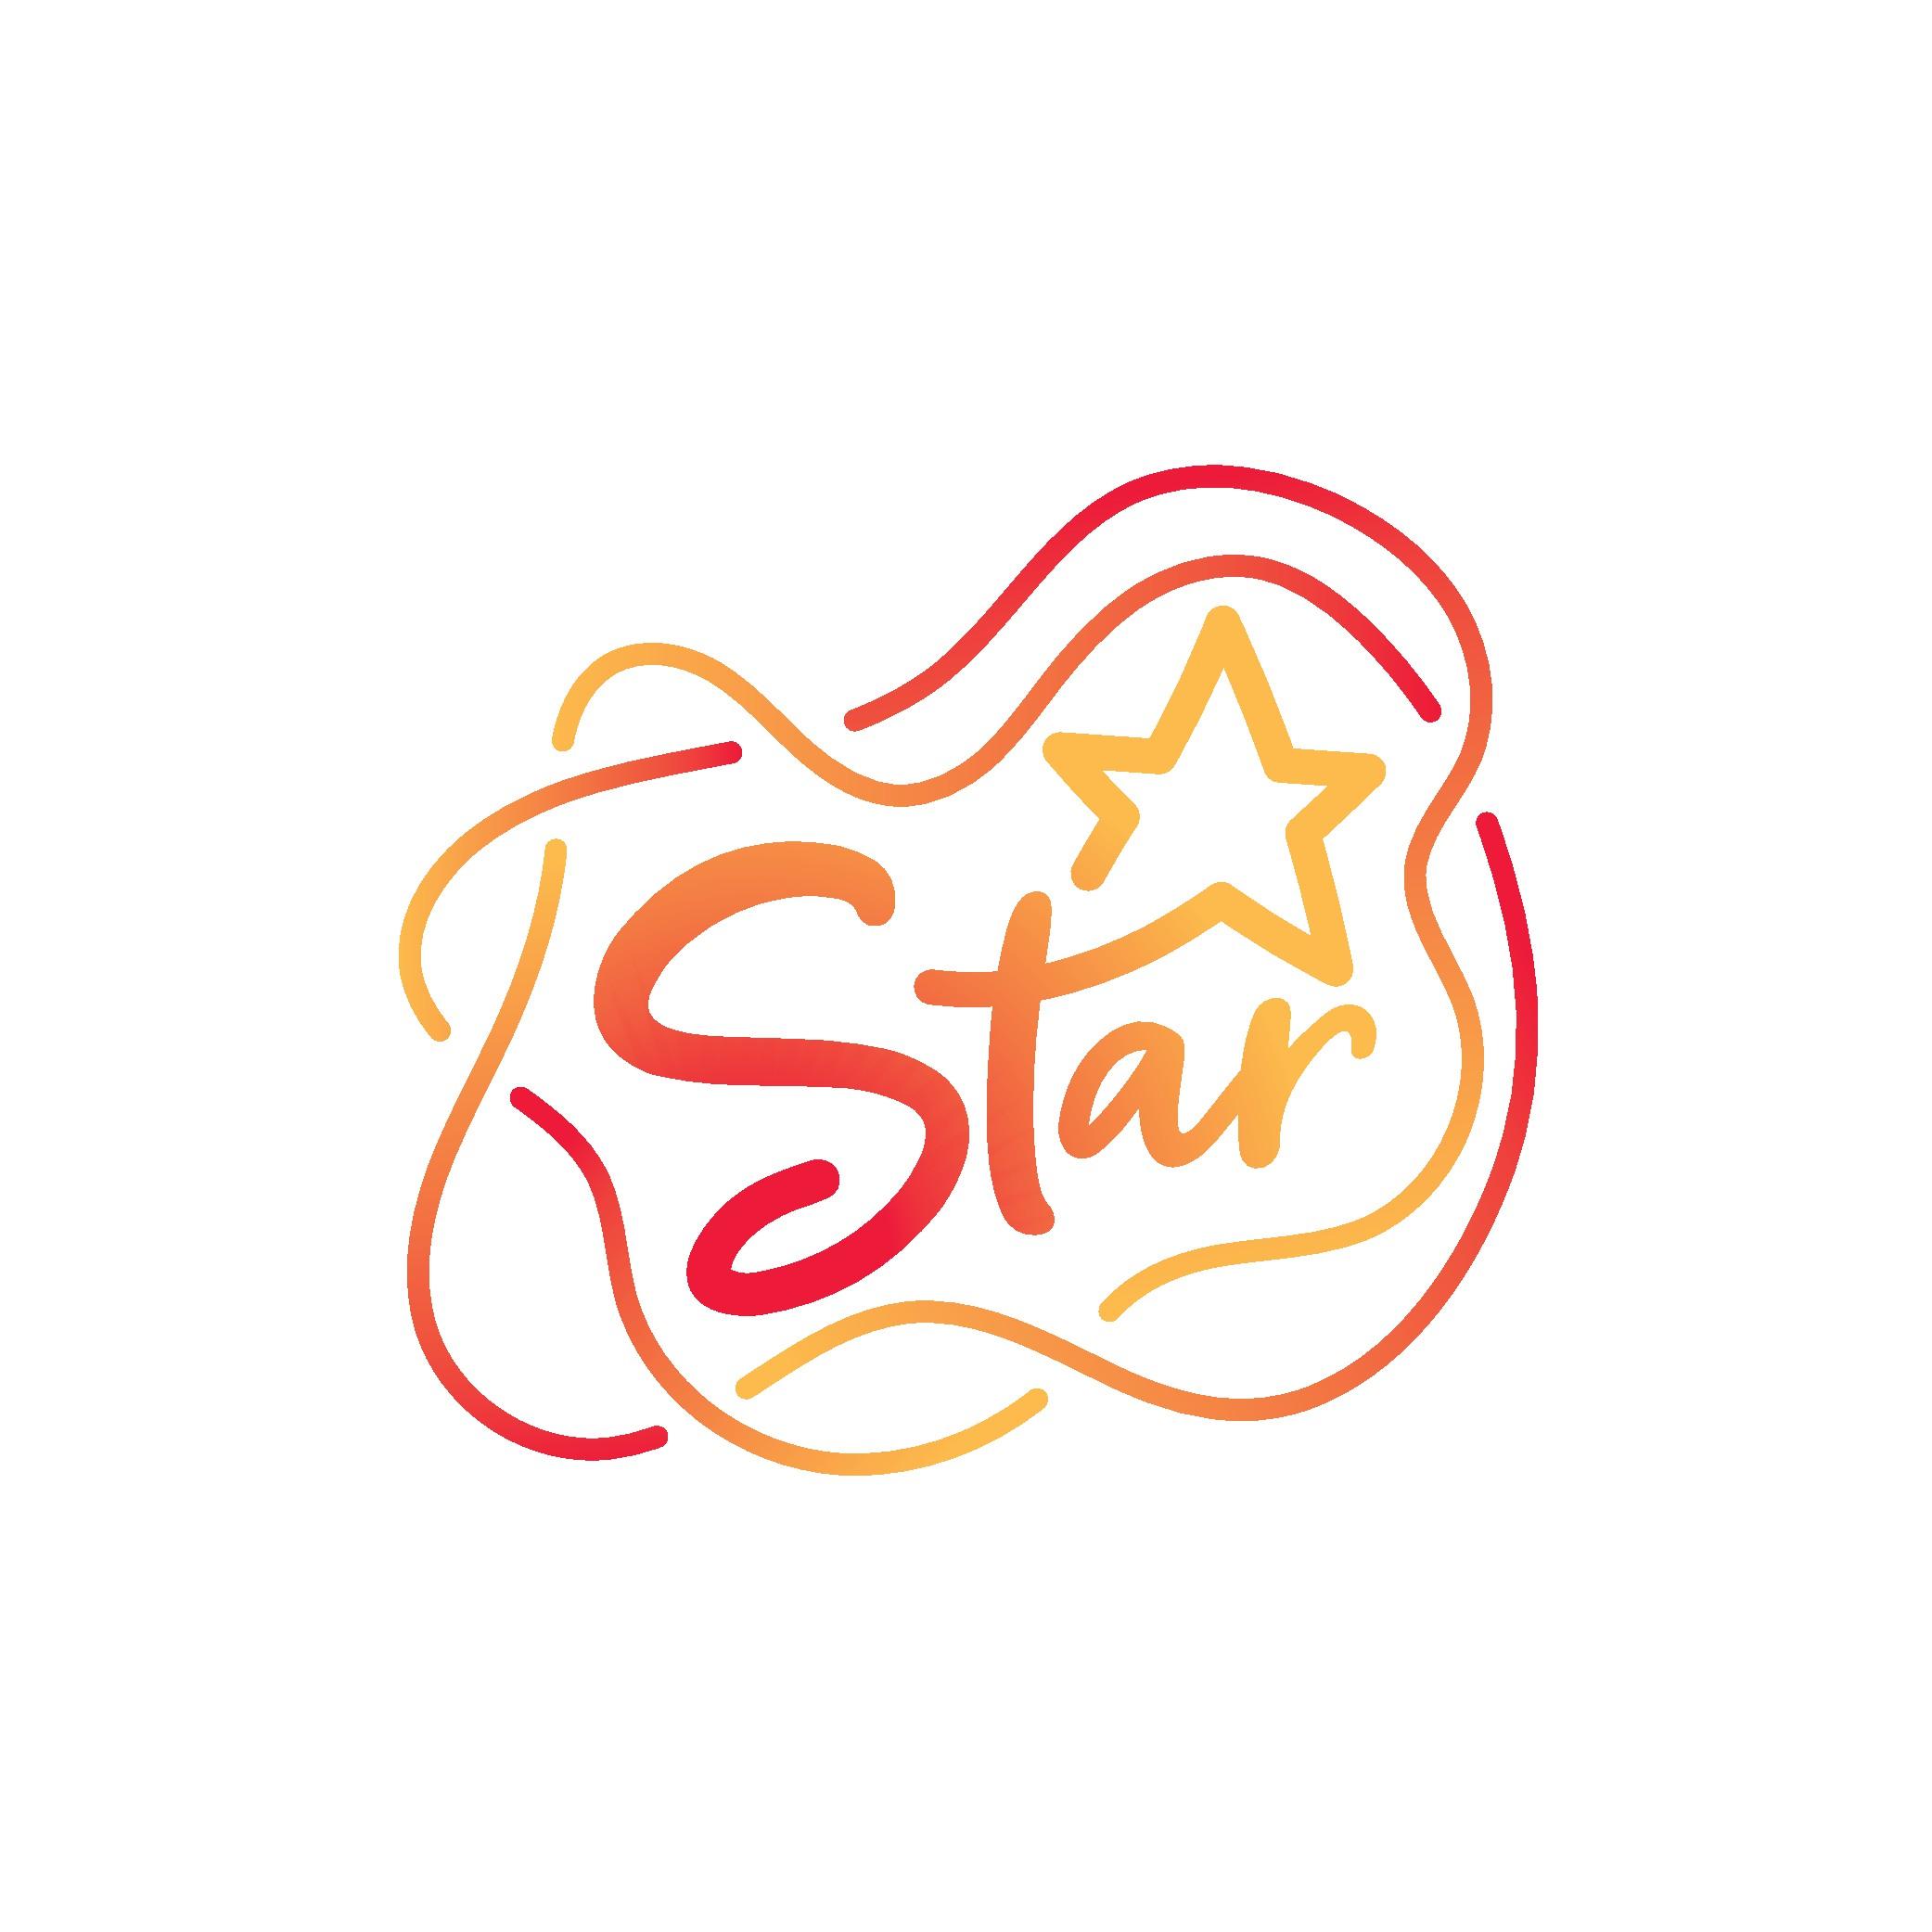 Design CSD brand logo that is relevant towards younger generations in Myanmar (Burma)